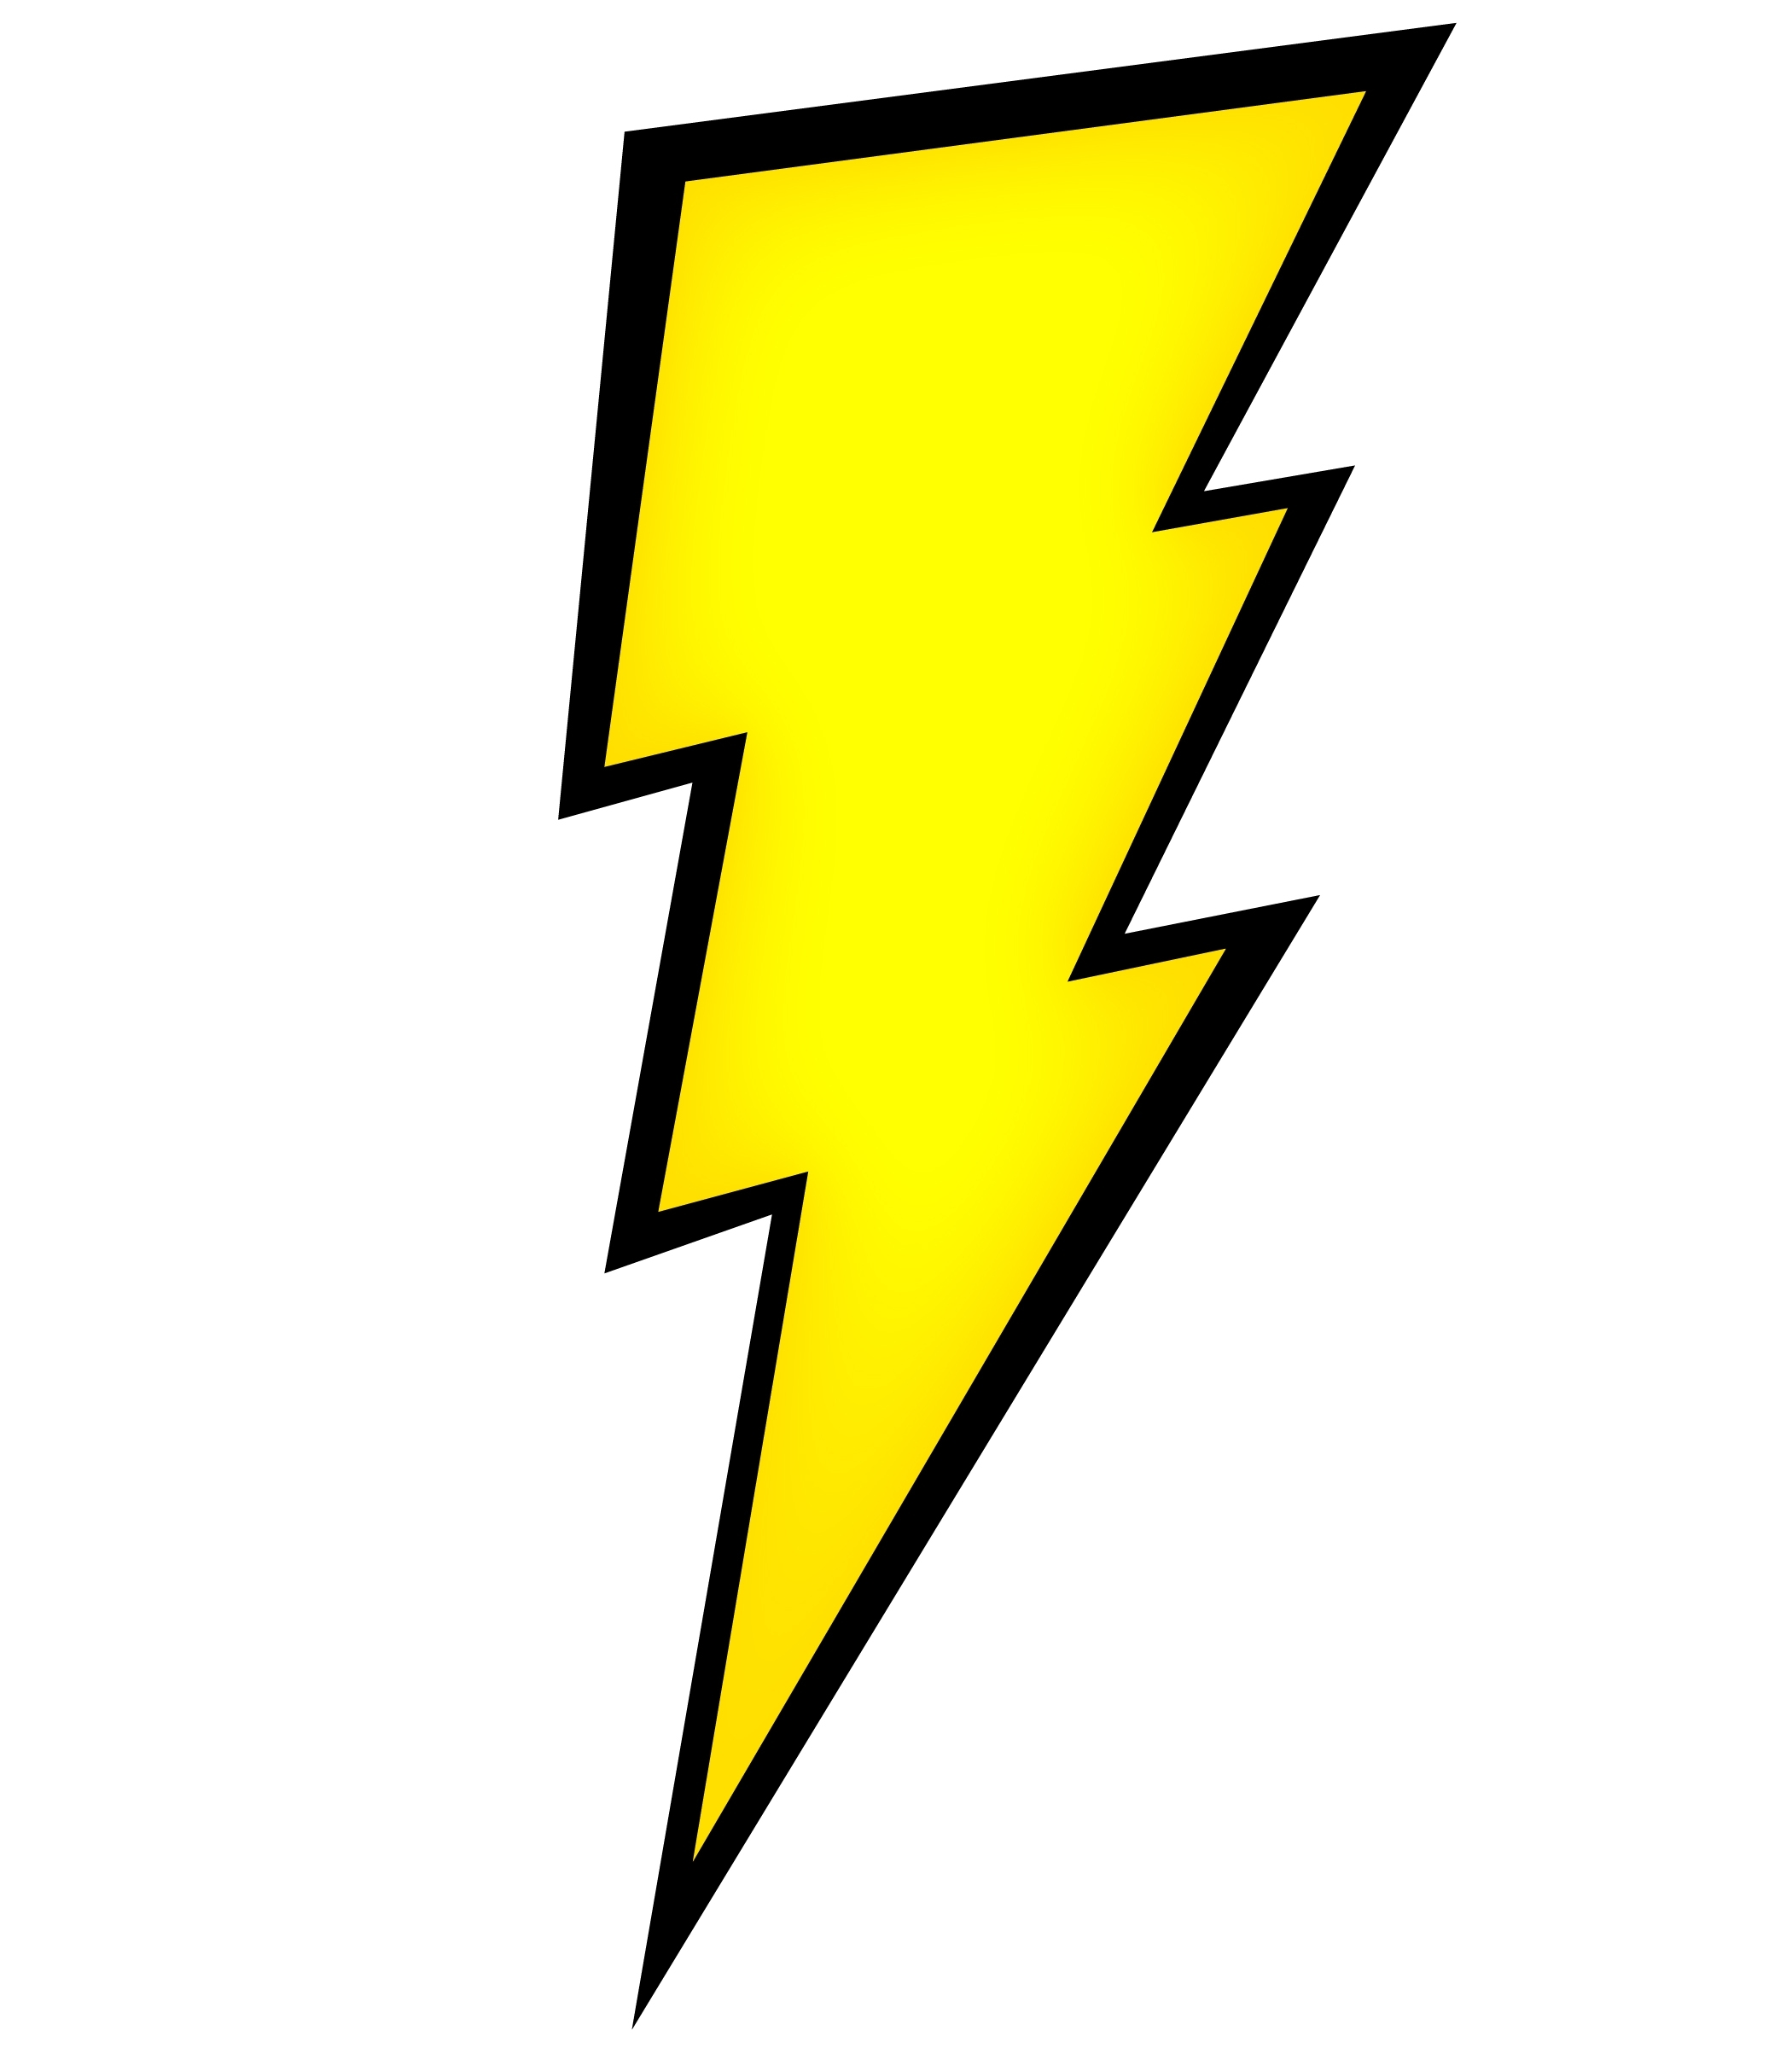 Lightning Bolt Clipart-lightning bolt clipart-13